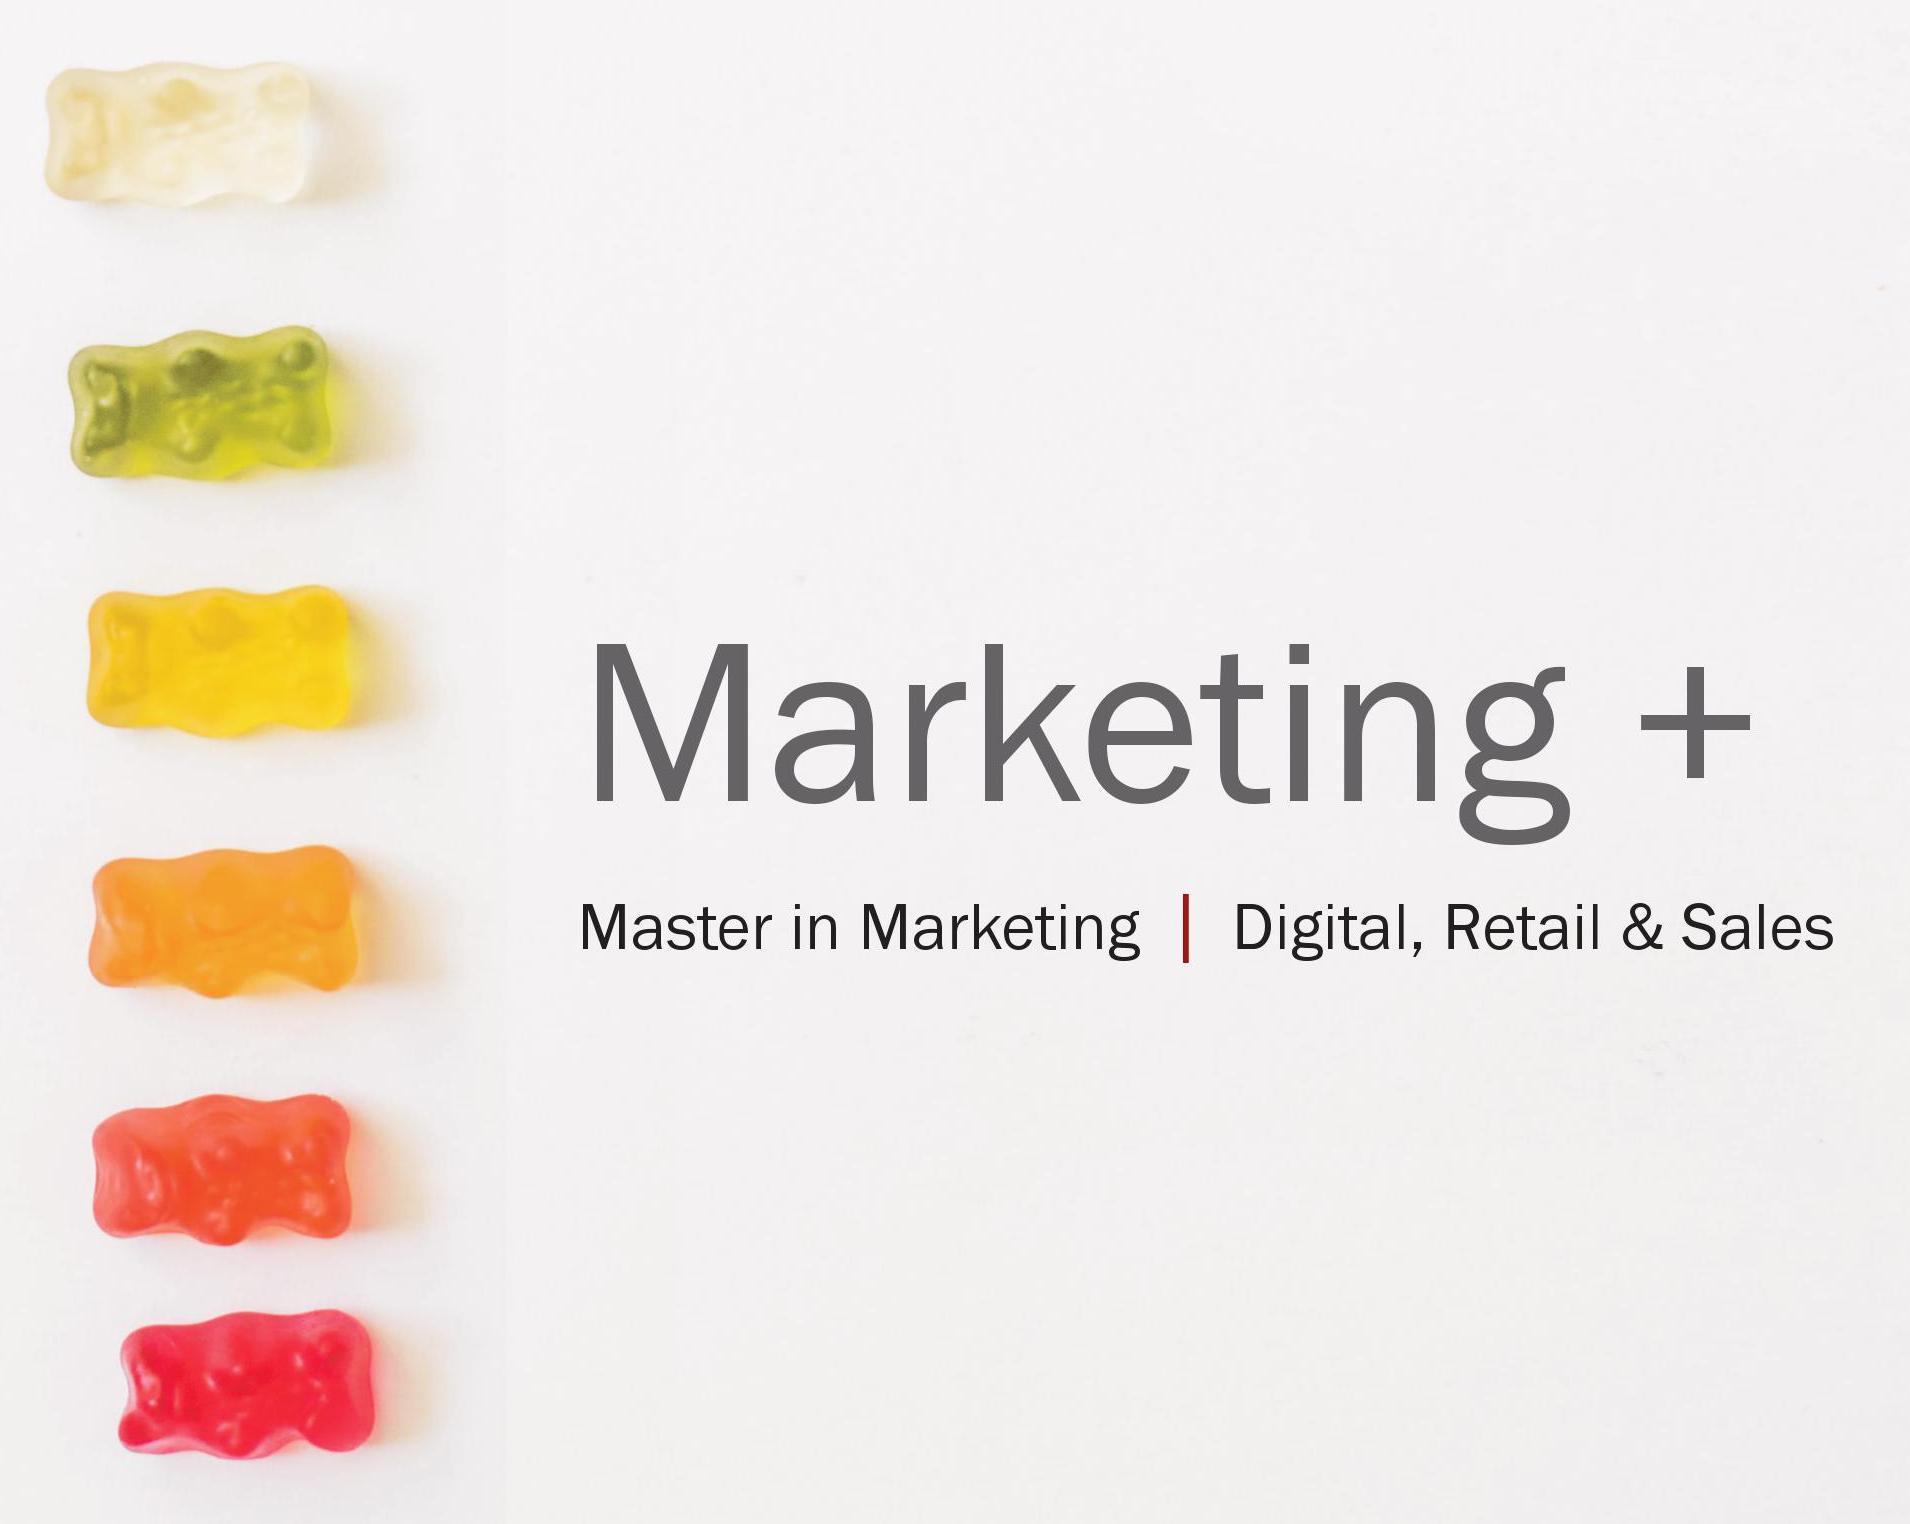 Master in Marketing+Digital, Retail & Sales